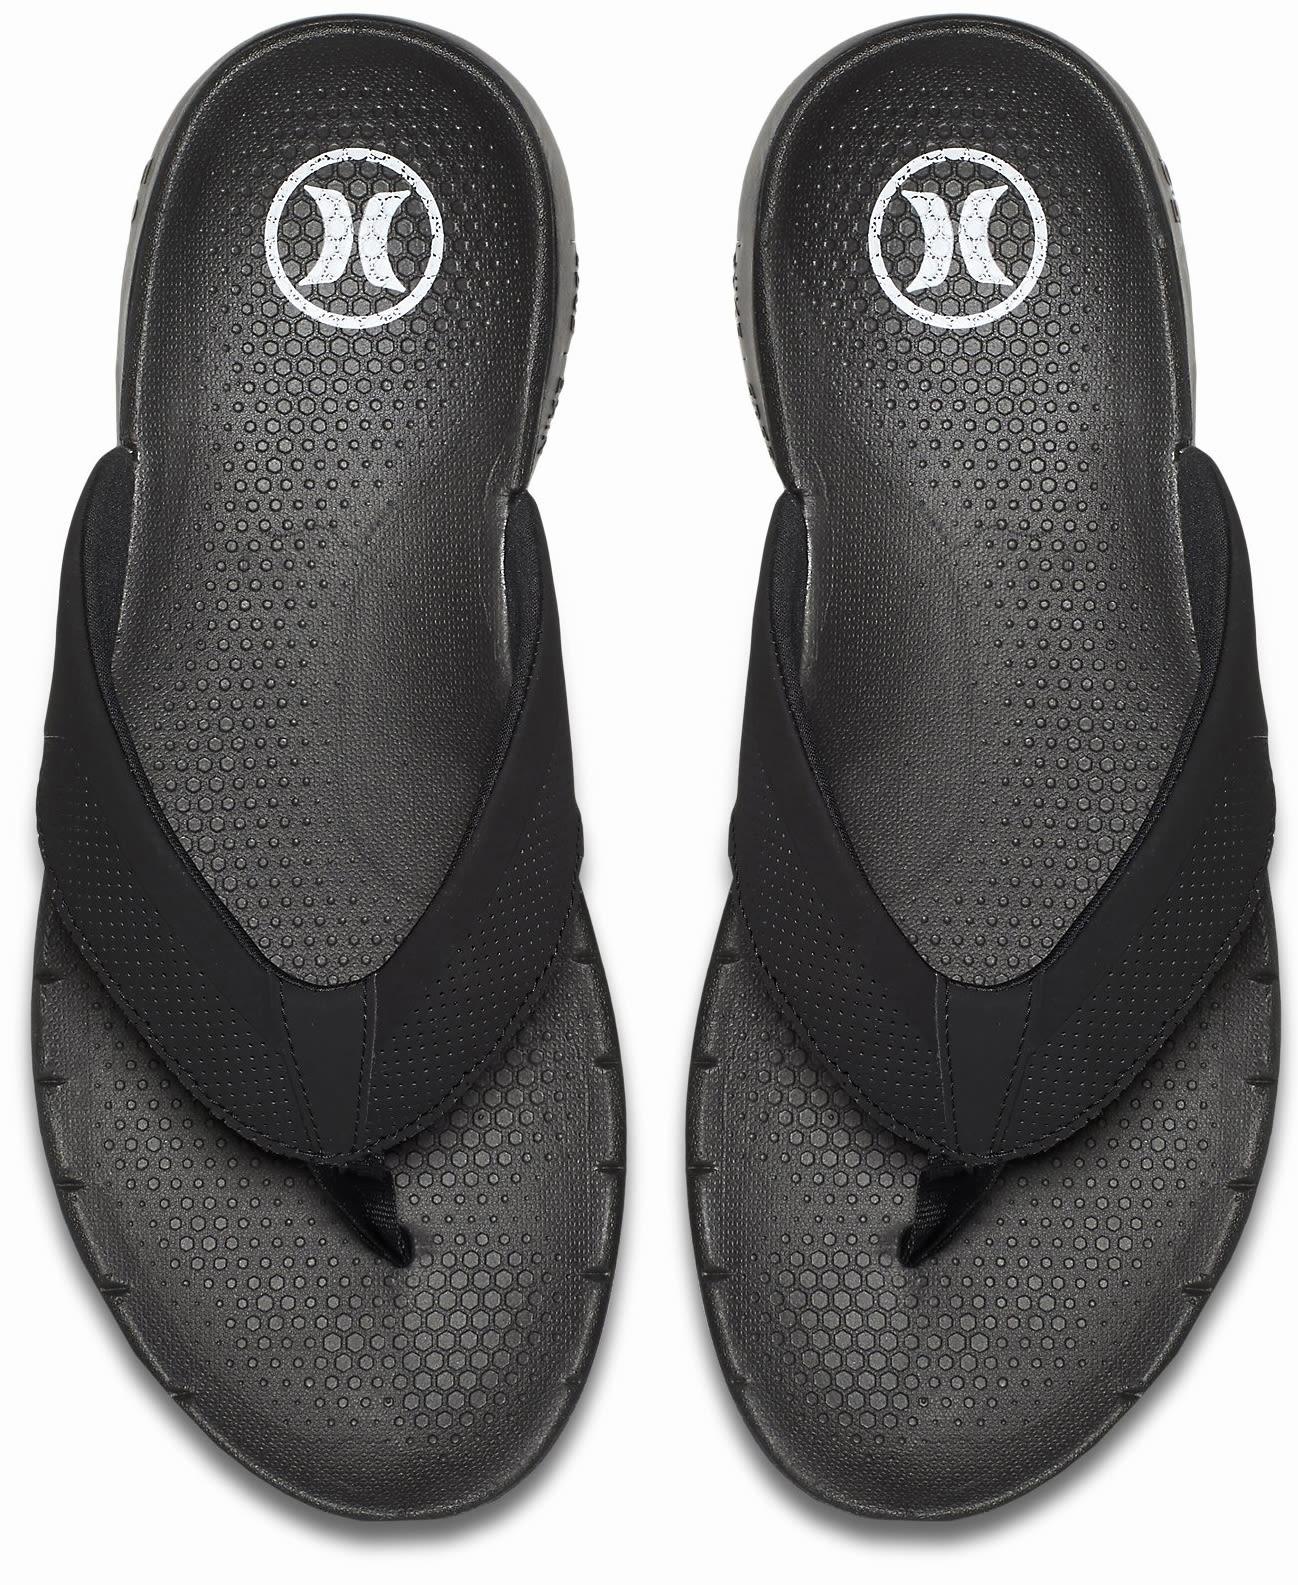 66ee4f94655 Hurley Phantom Free Sandals - thumbnail 2